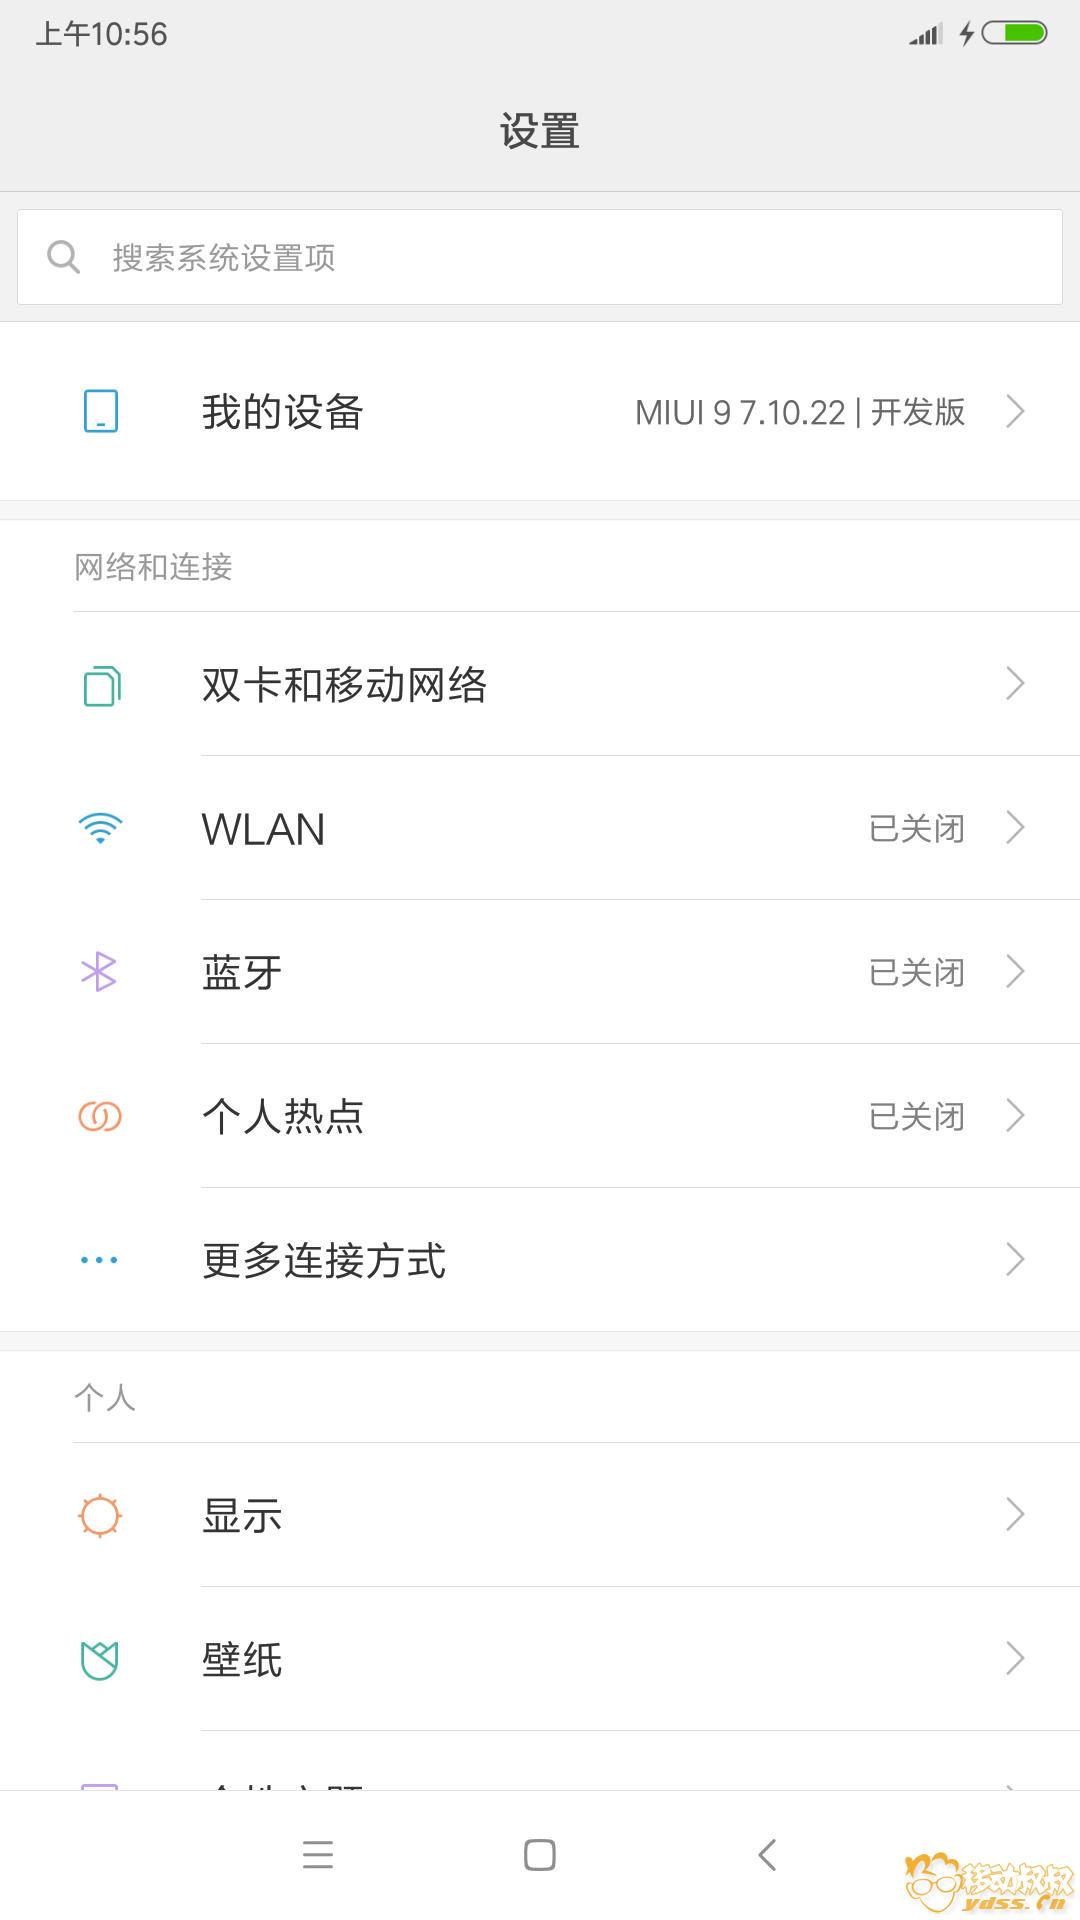 Screenshot_2017-10-22-10-56-58-740_com.android.settings.png